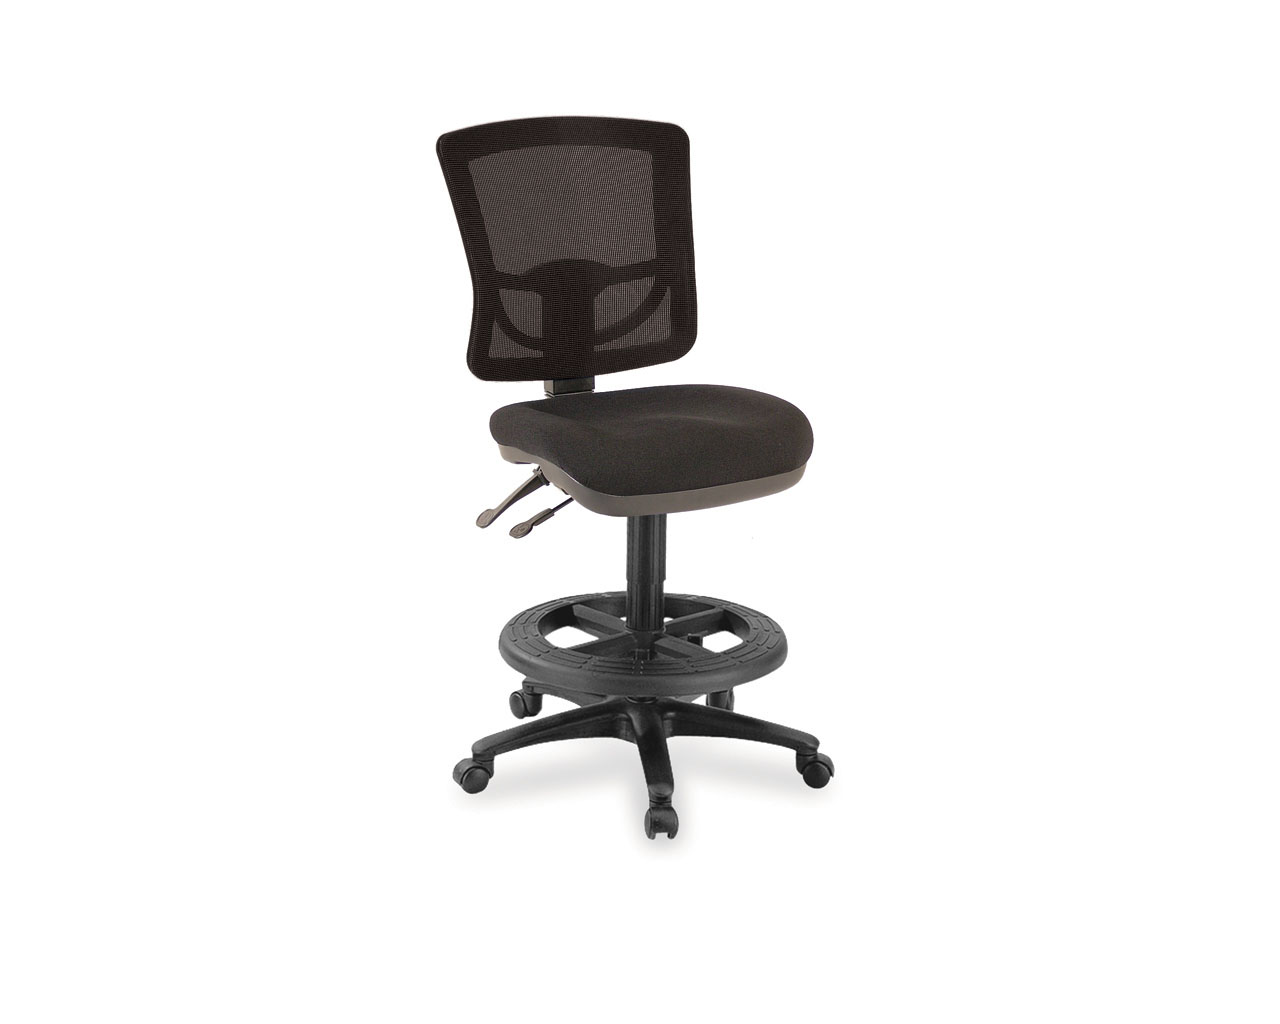 office chair kelowna poang cushion chairs seating ergonomic desk lovan mesh drafting